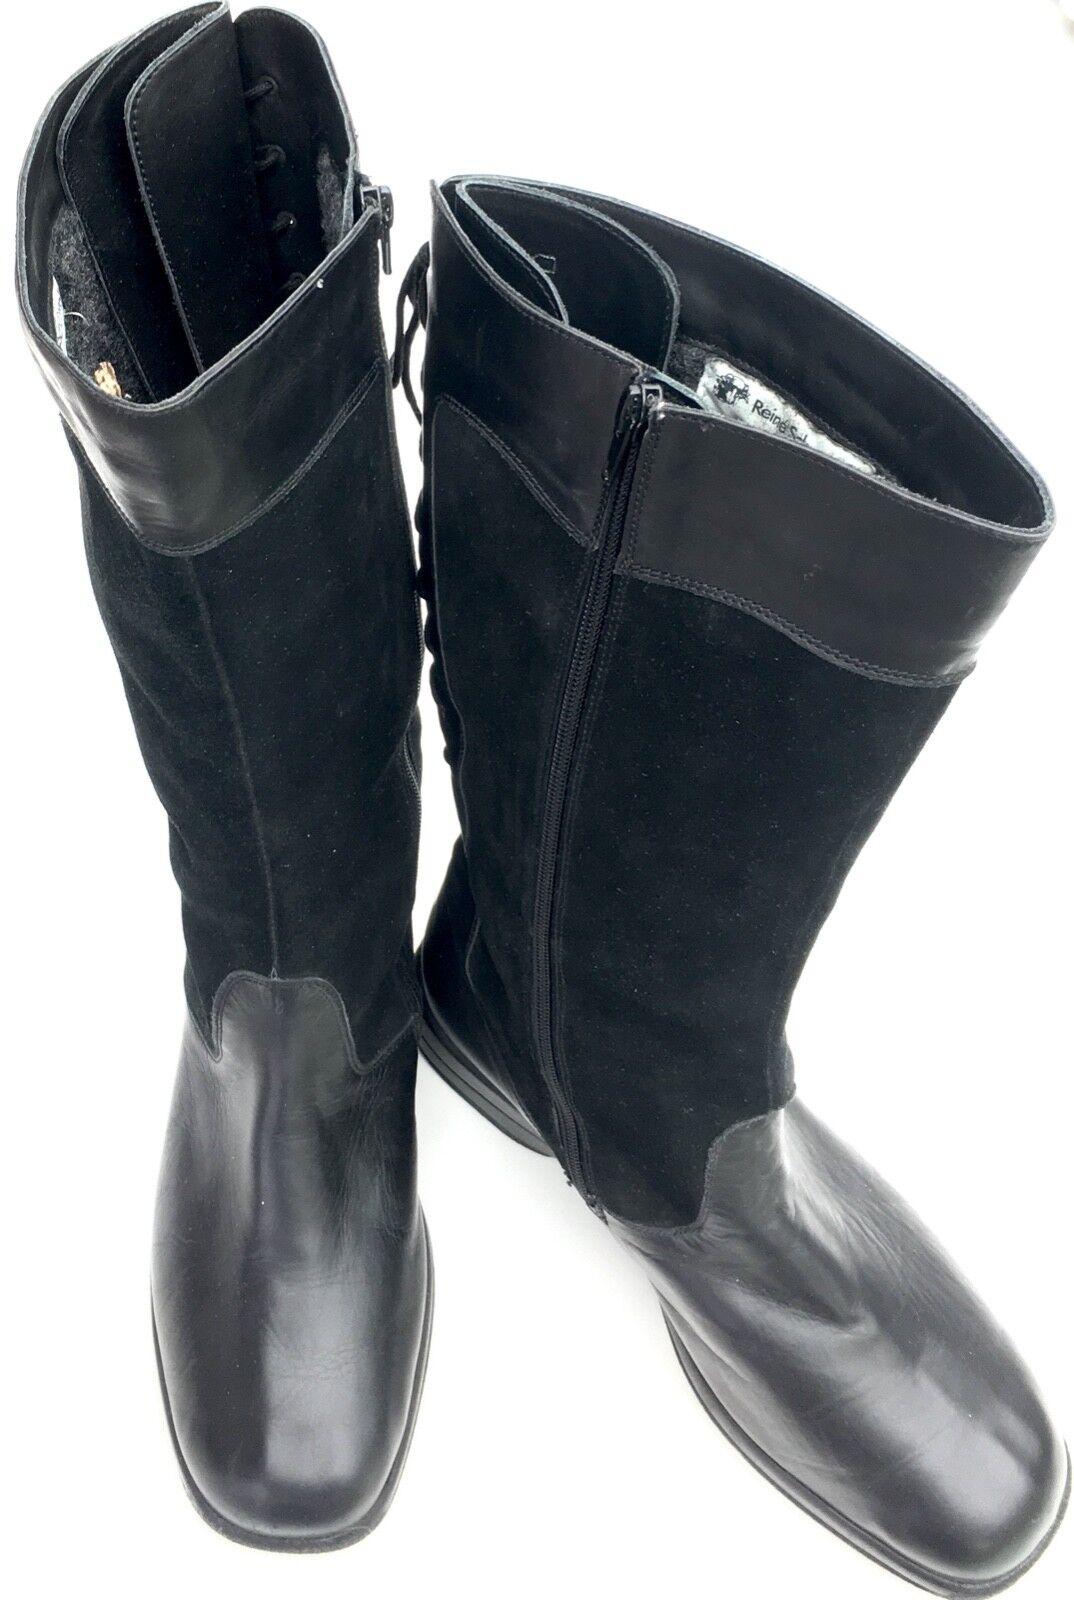 Solidus señora botas Echt Leder negro, pura pura pura lana virgen-nuevo talla 42